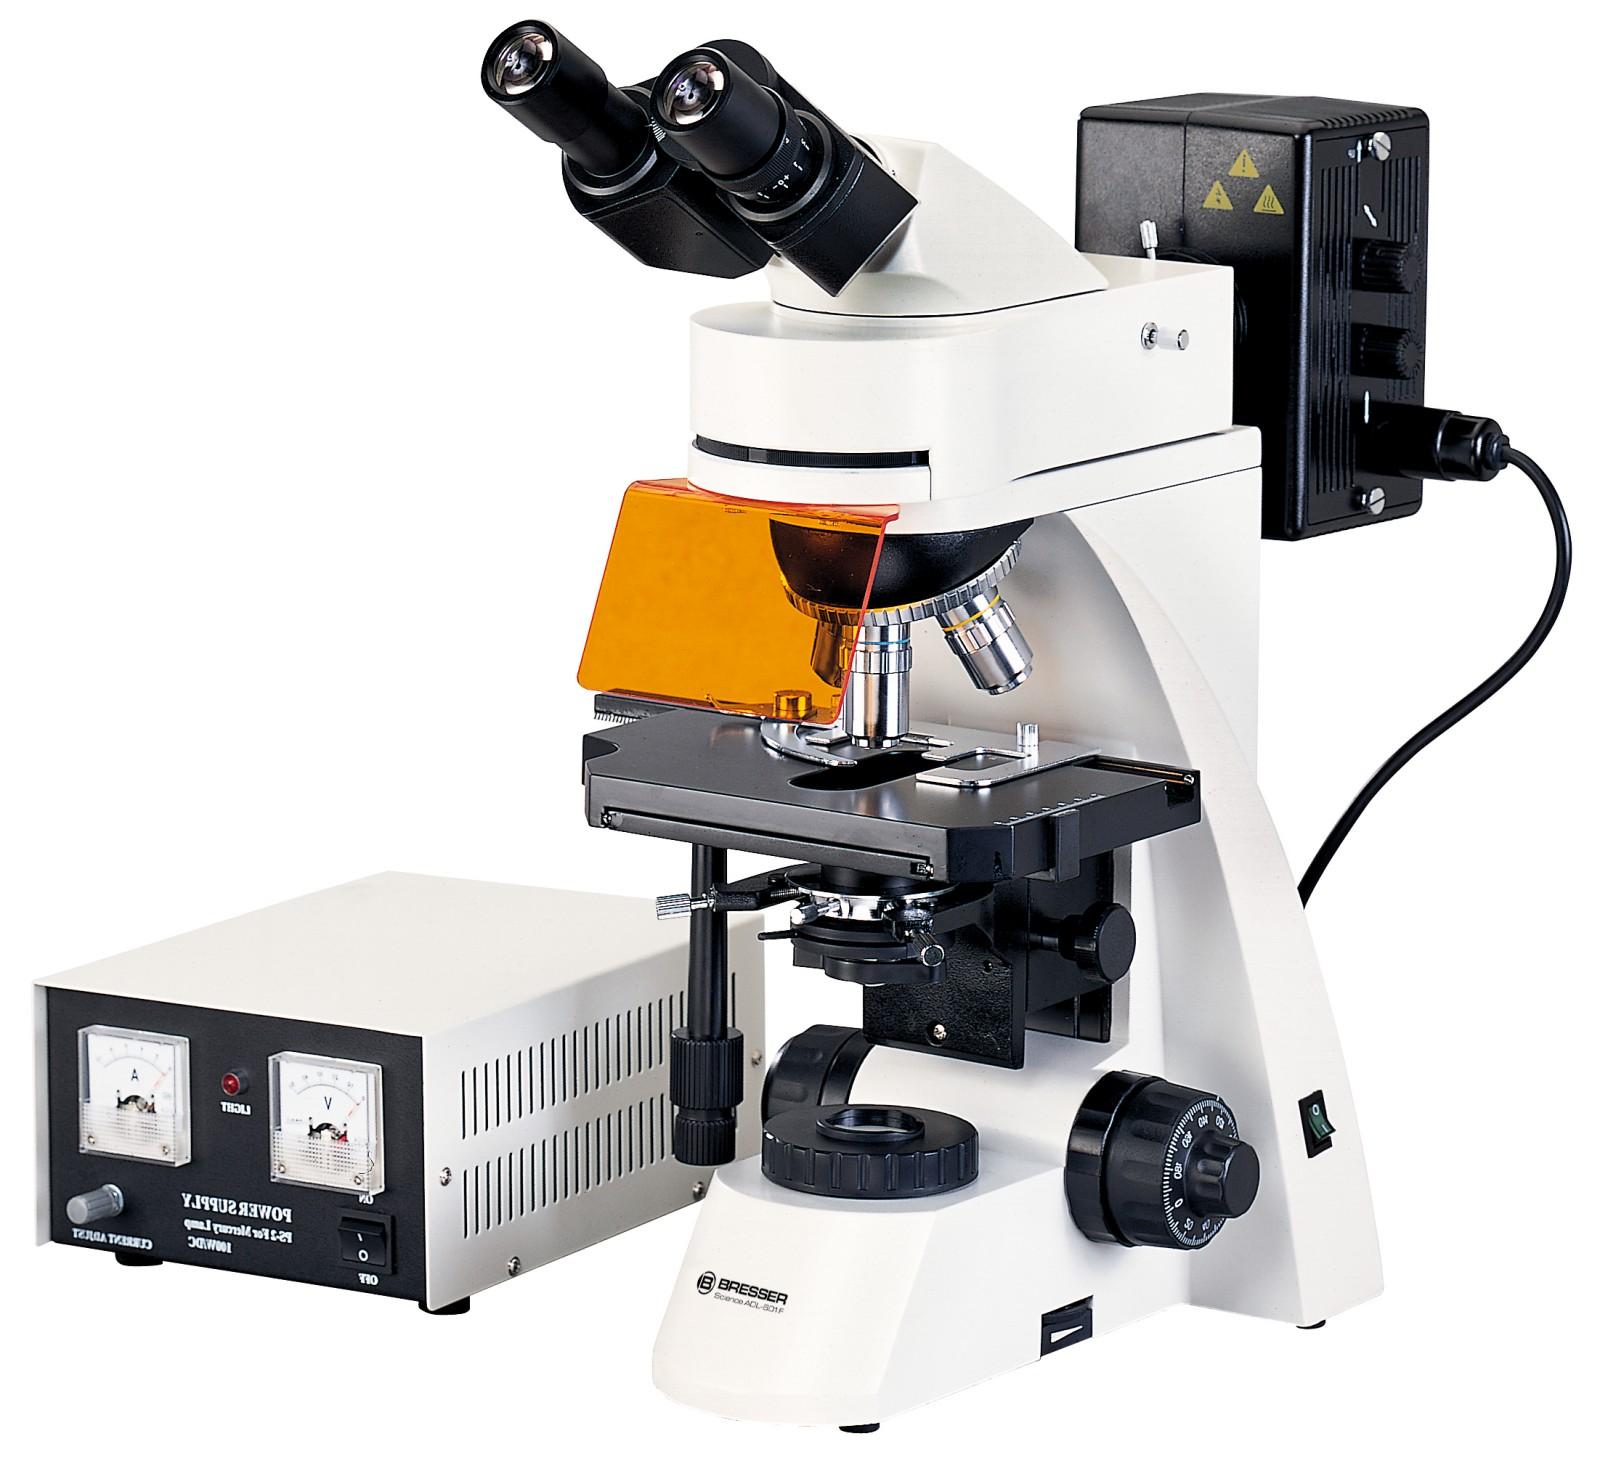 Bresser Science ADL-601F 40x-1000x